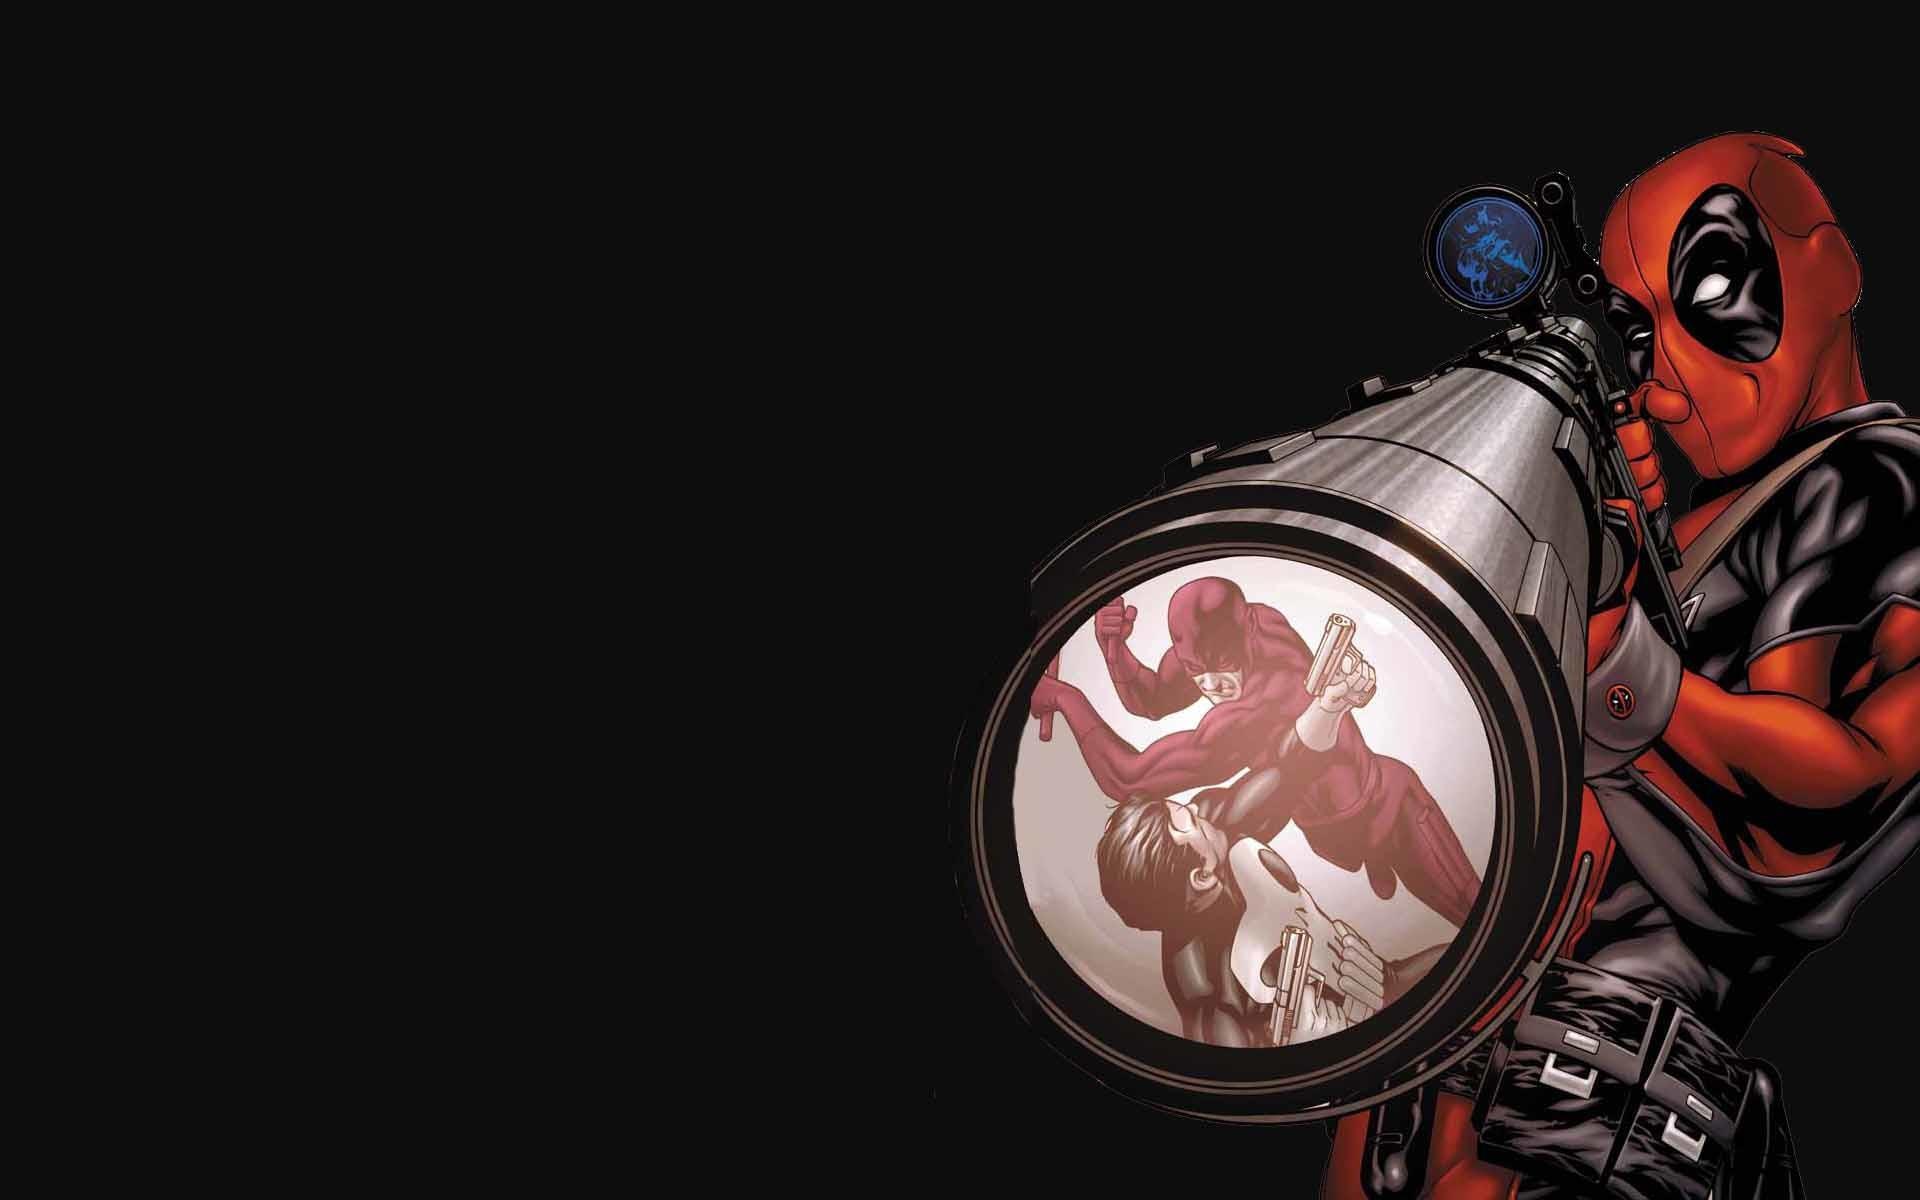 Cool Deadpool Wallpaper (74+ images)